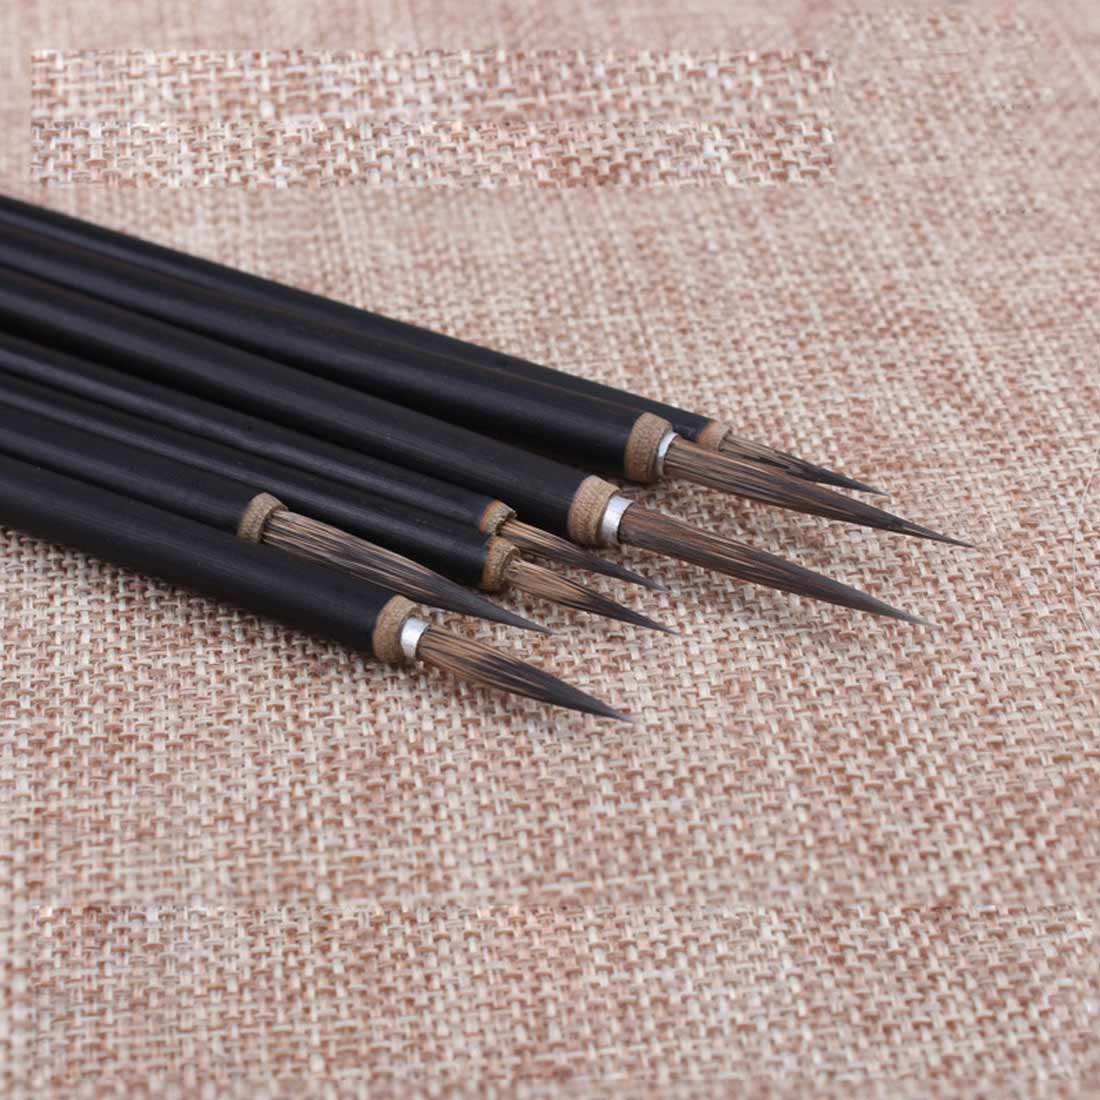 3pcs Wolf Hair Brush Hook Line Pen Calligraphy Pens Black Bamboo Penholder Artist Drawing Painting Watercolor Painting Supplies